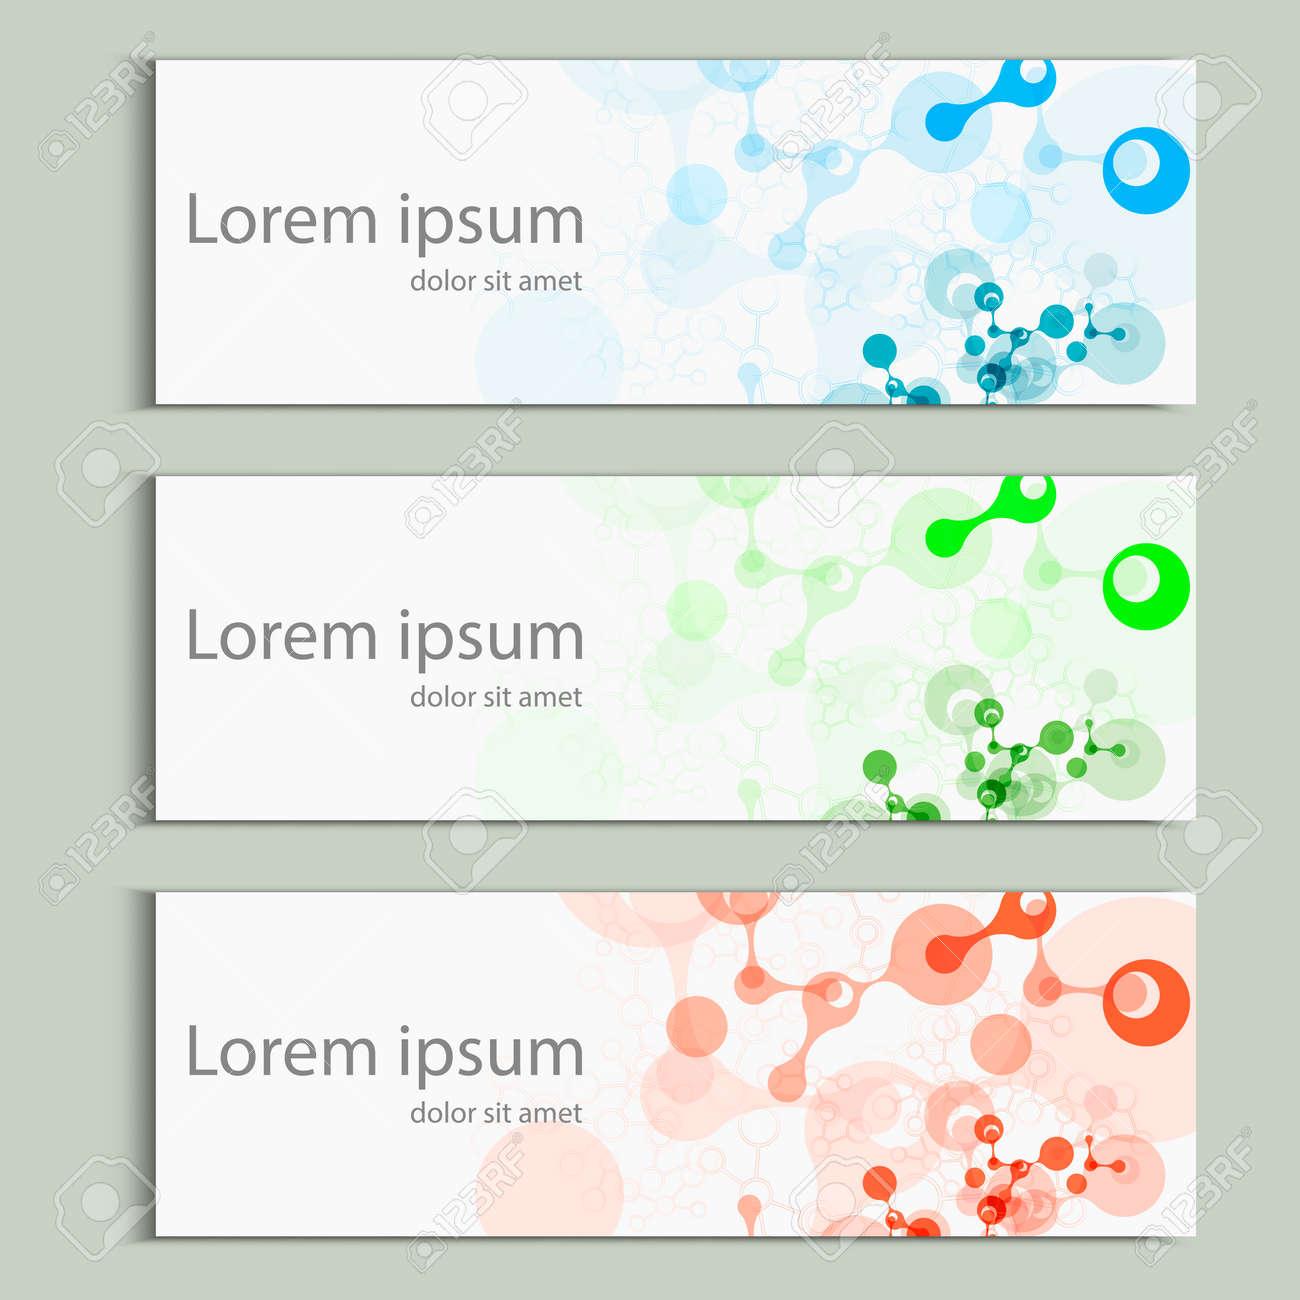 Abstract molecules banner design. Vector cover template. - 59921162